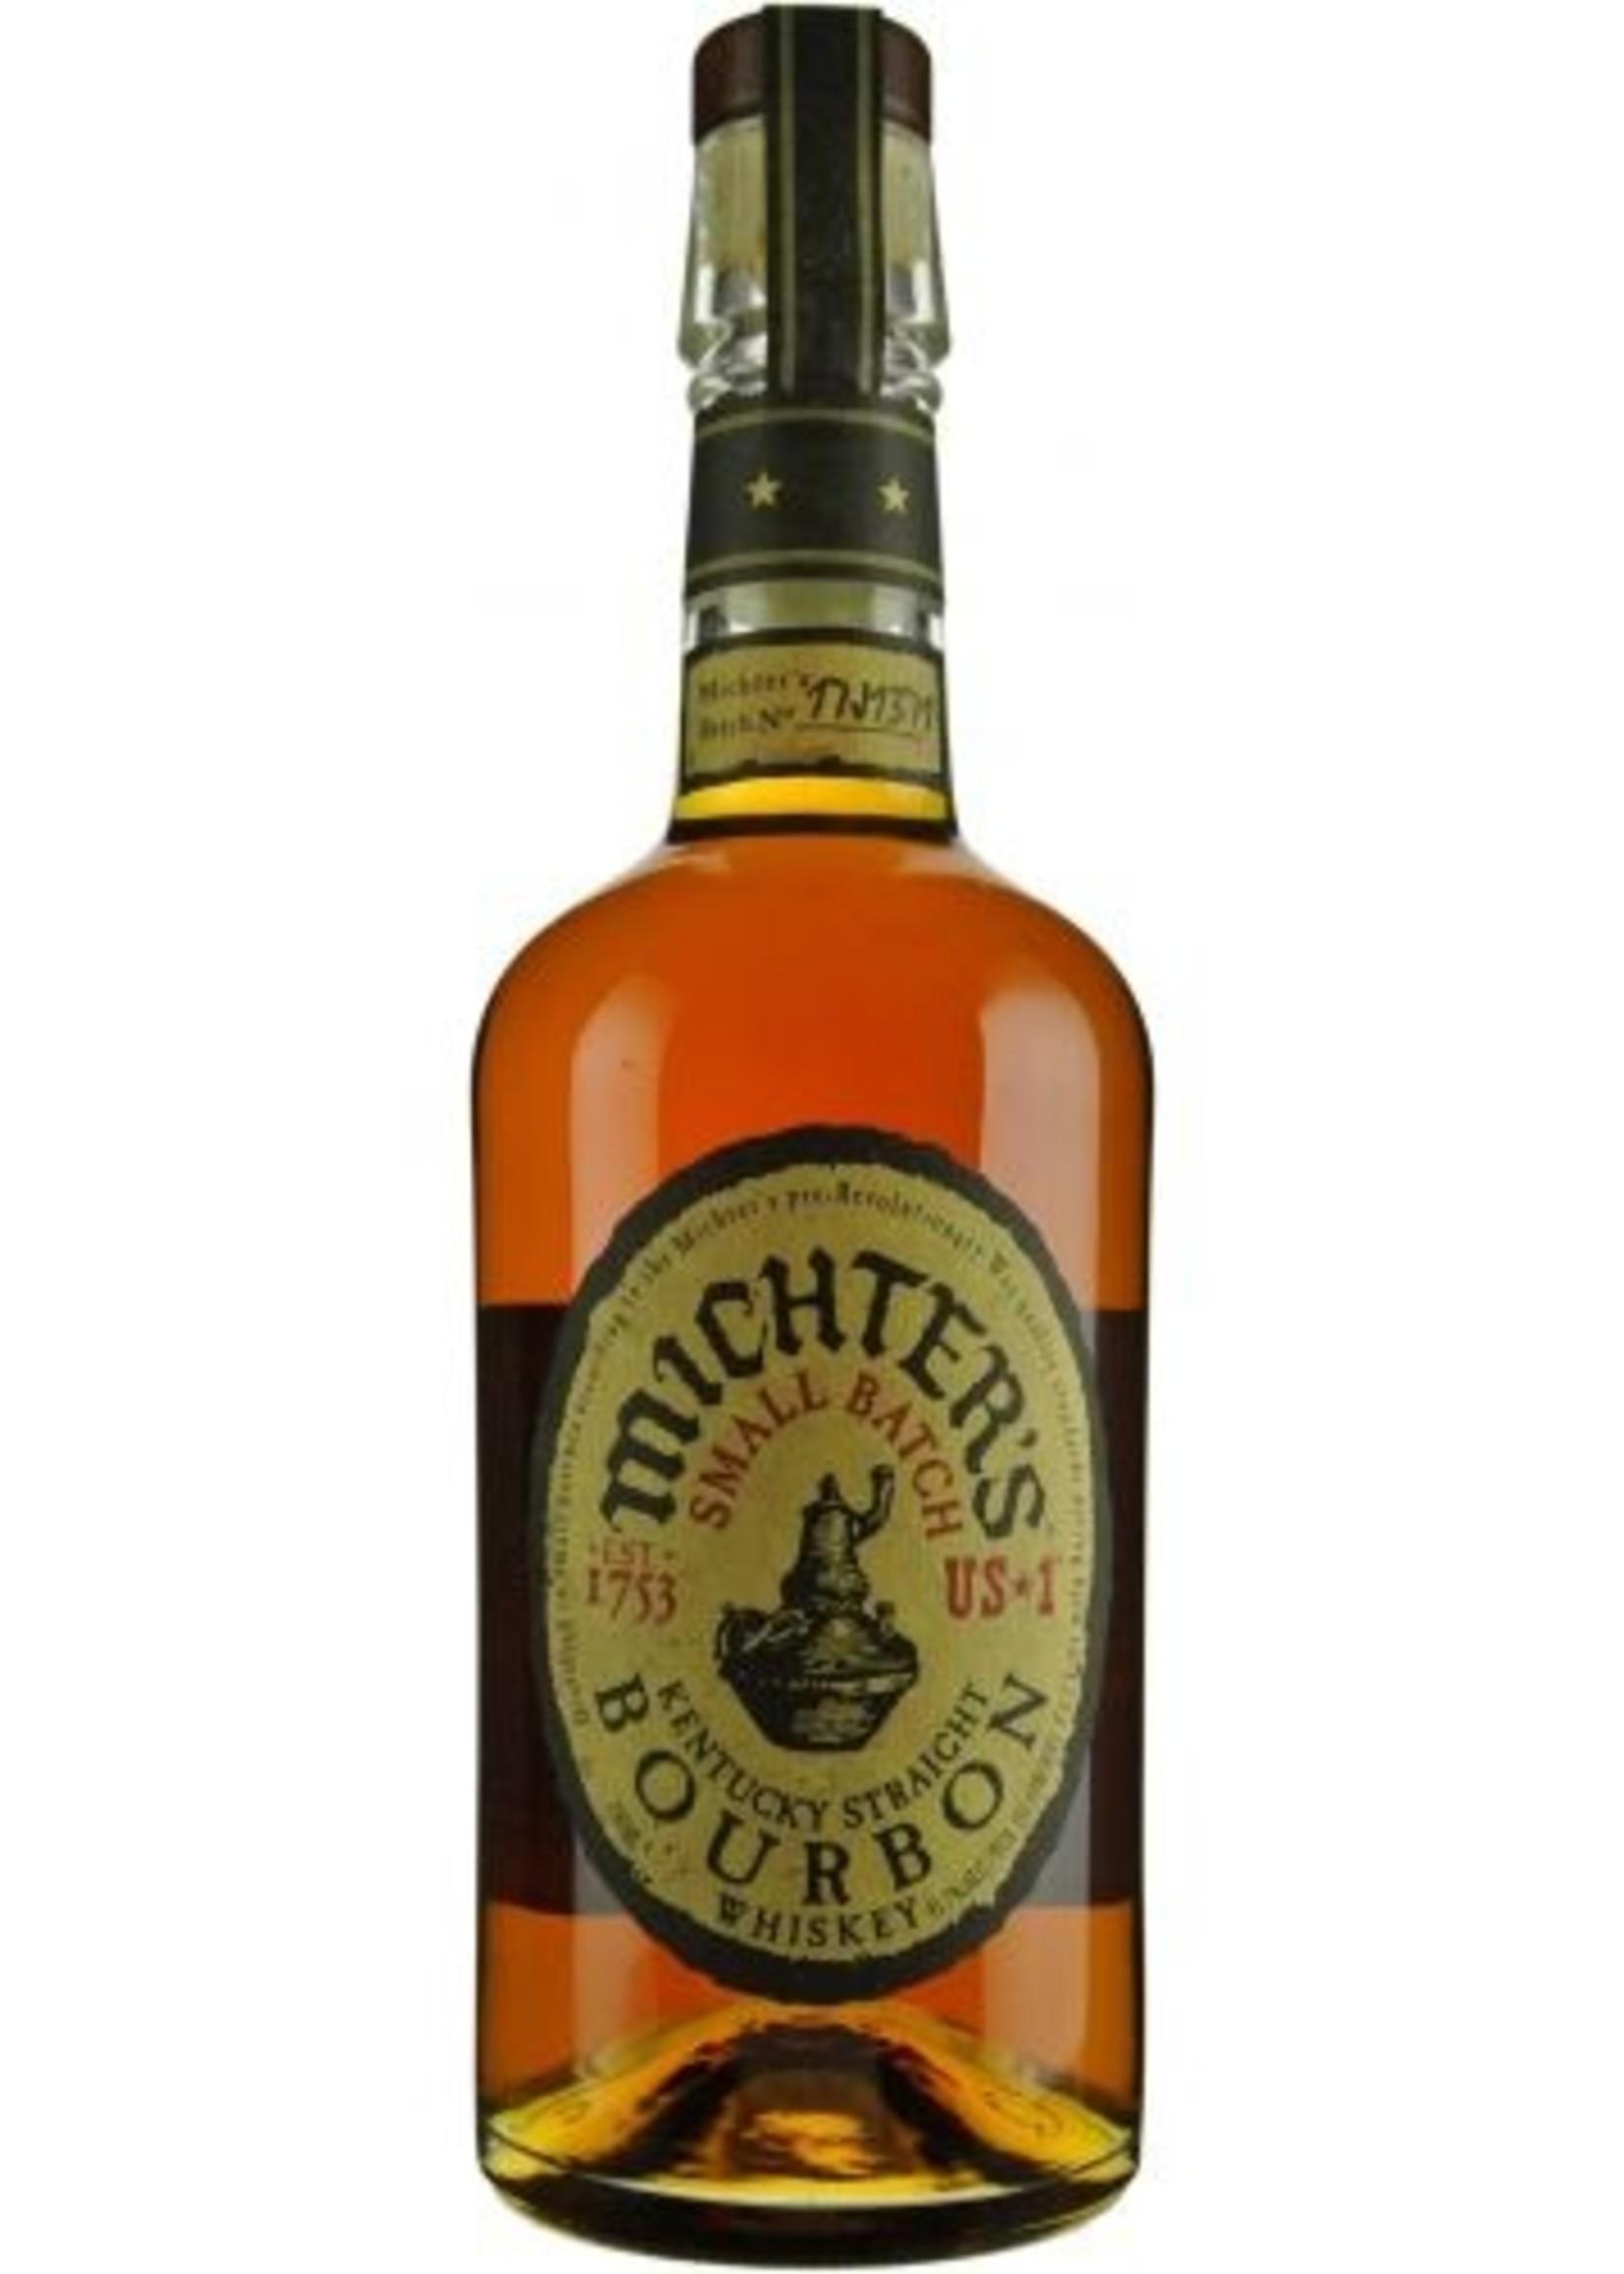 Michters Small Batch US1 Bourbon